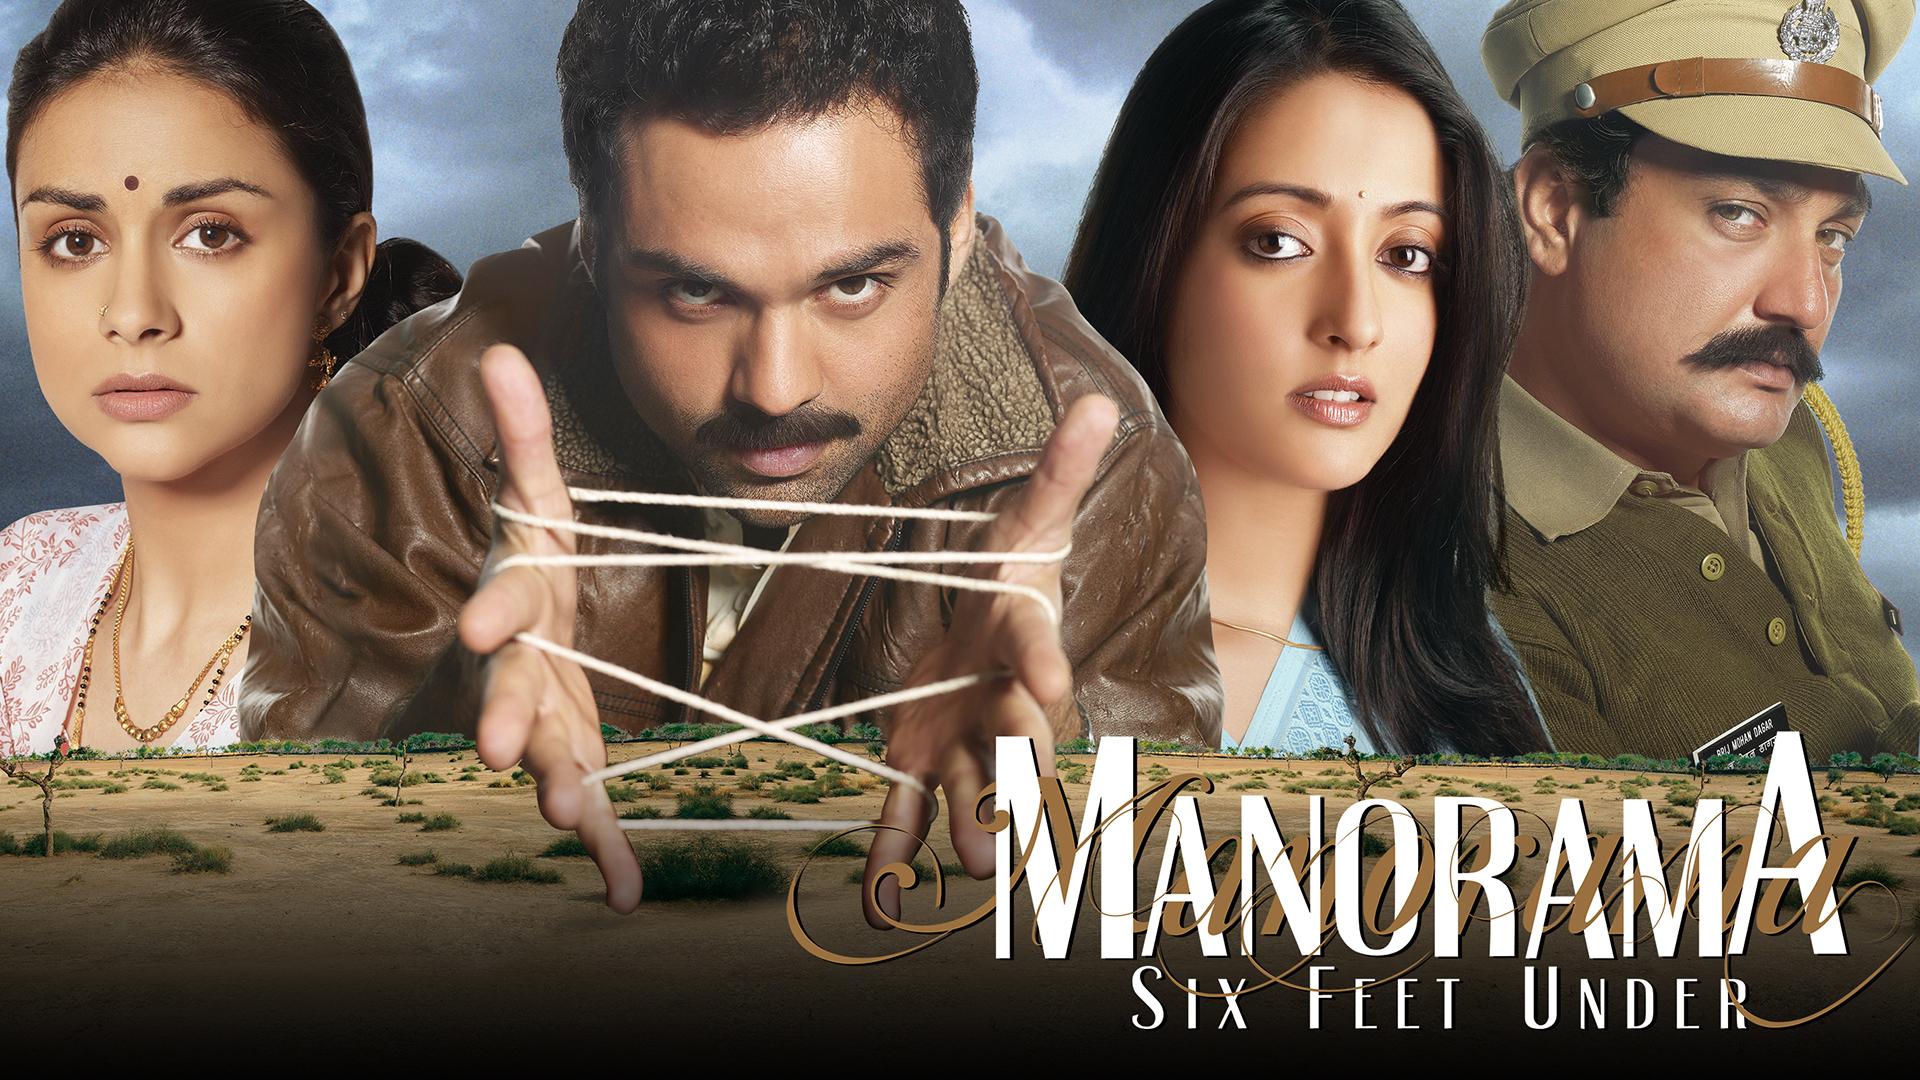 Watch Manorama Six Feet Under | Prime Video